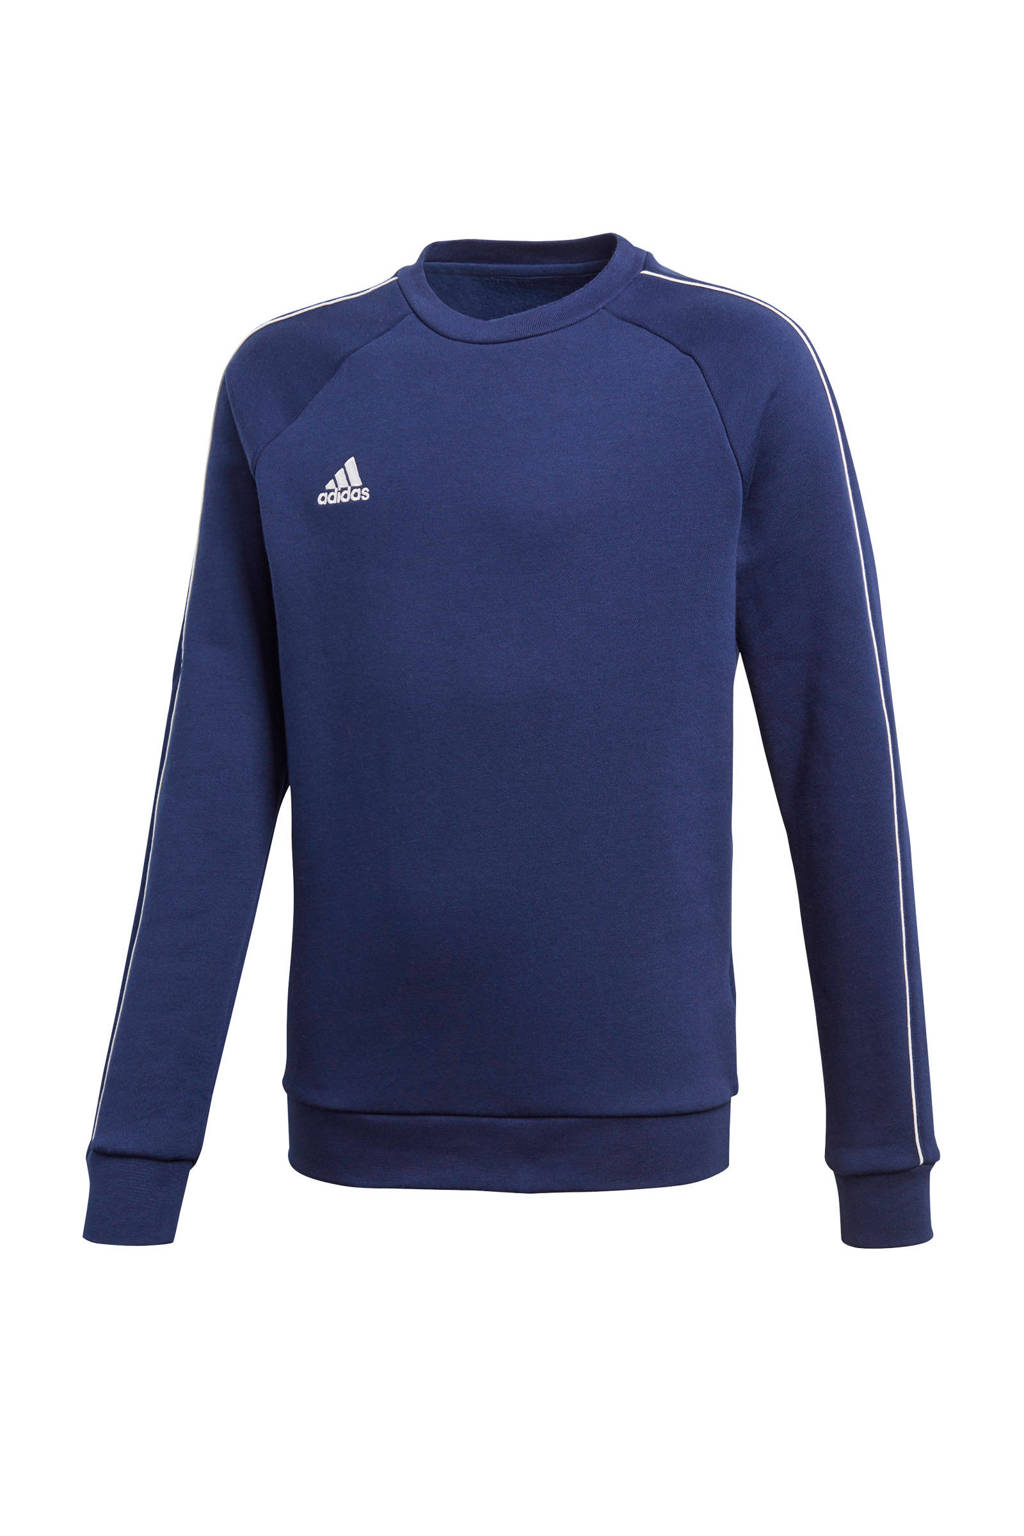 adidas performance   sportsweater donkerblauw, Donkerblauw/wit